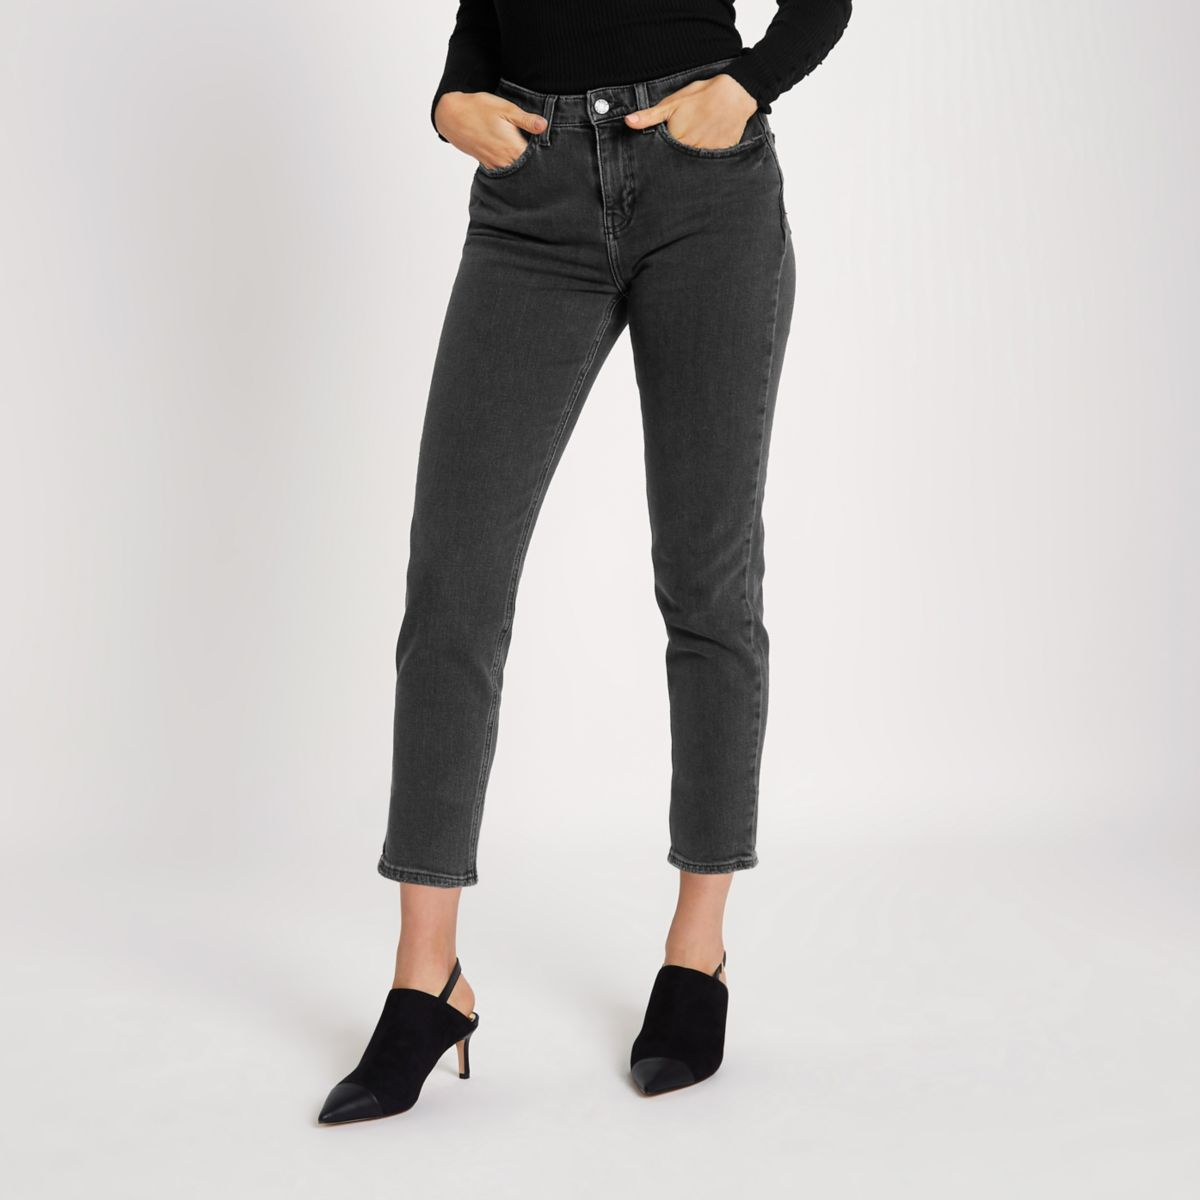 Black Casey slim fit jeans